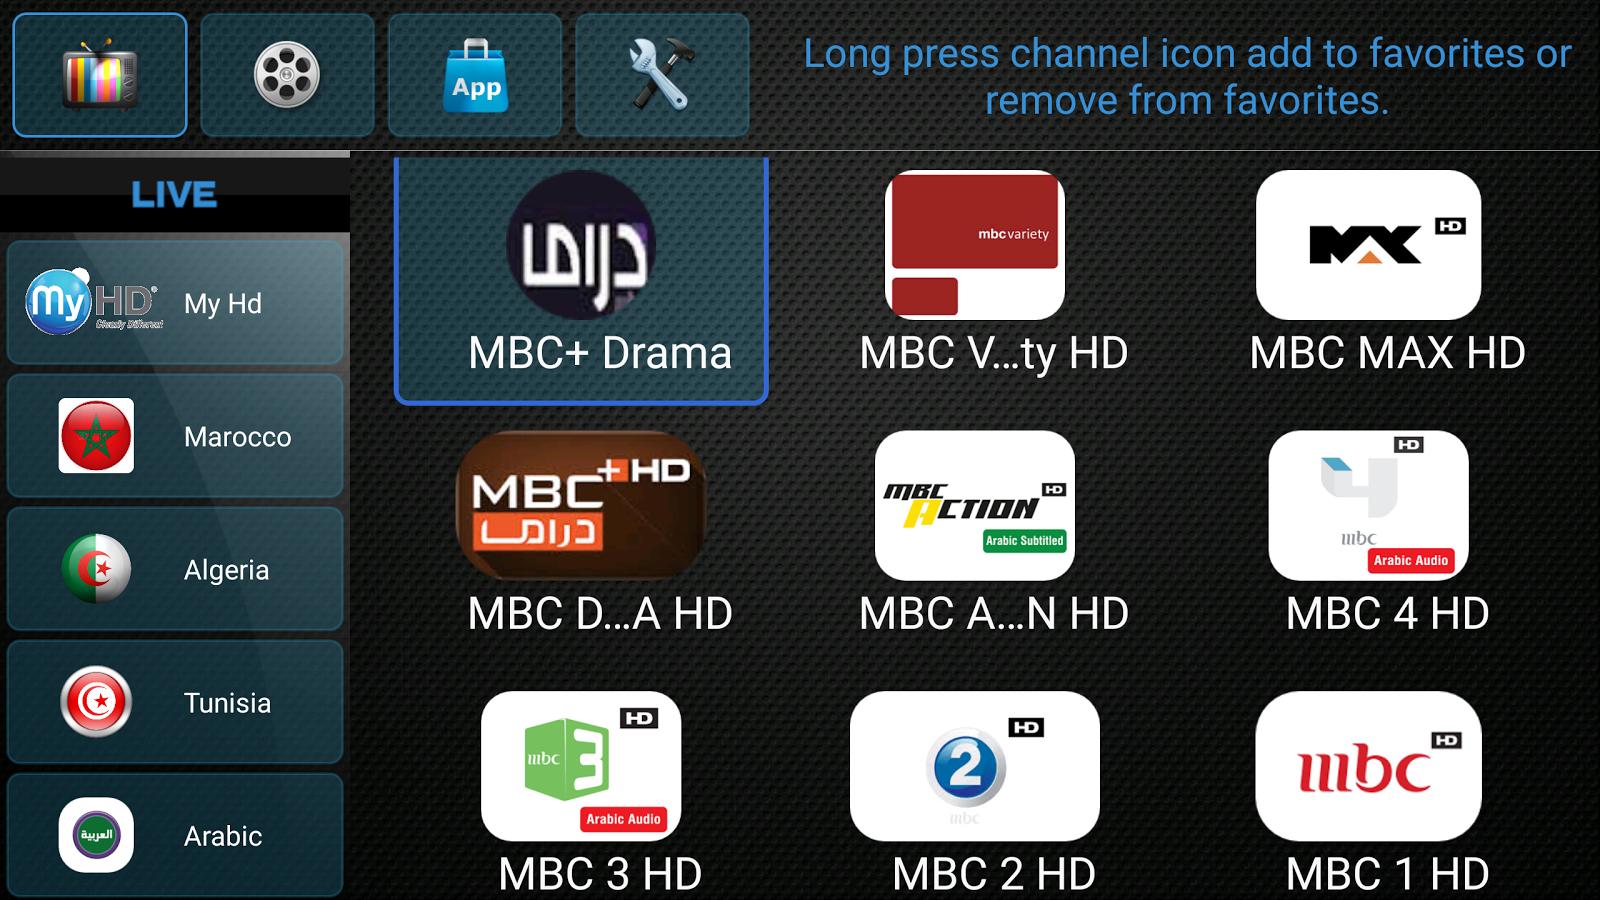 Atlas Iptv Vod v3 3 0 0 APK Download - Android Entertainment Apps